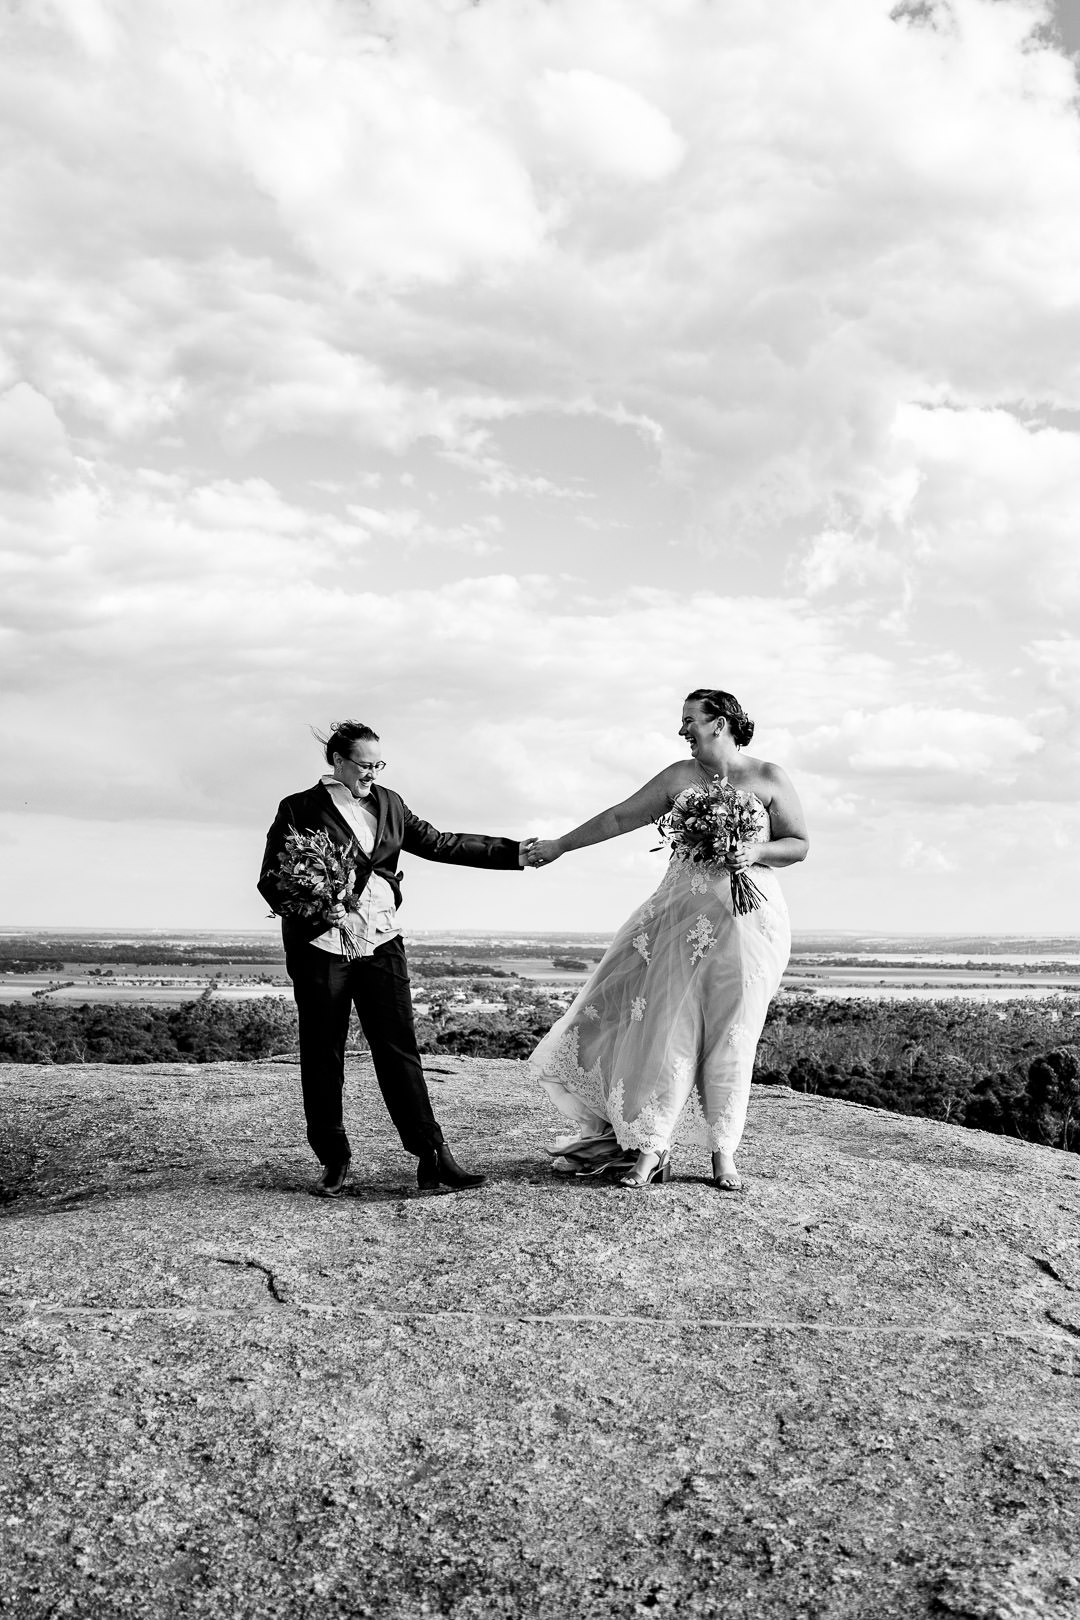 two brides on their wedding day